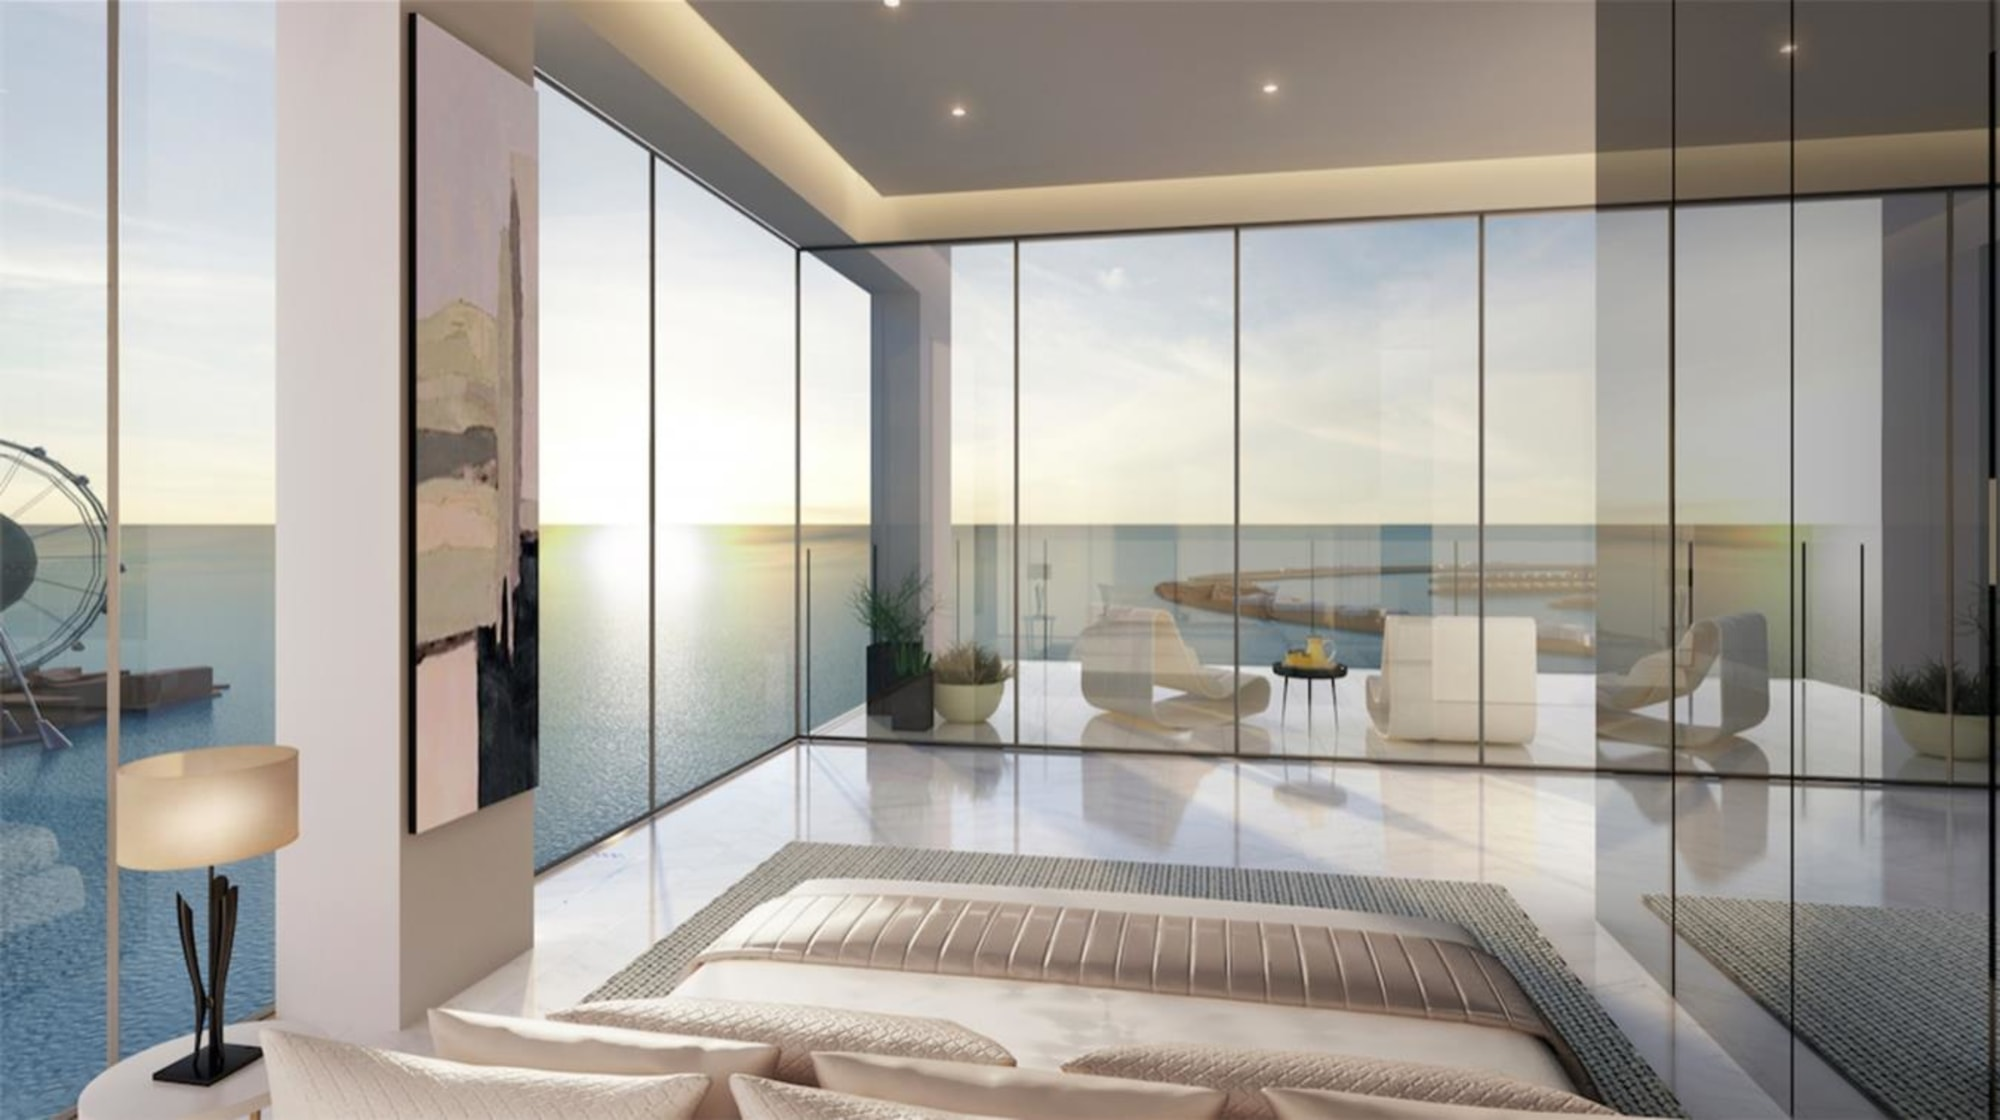 1/JBR Luxury 2 Bed Beachfront Apartment